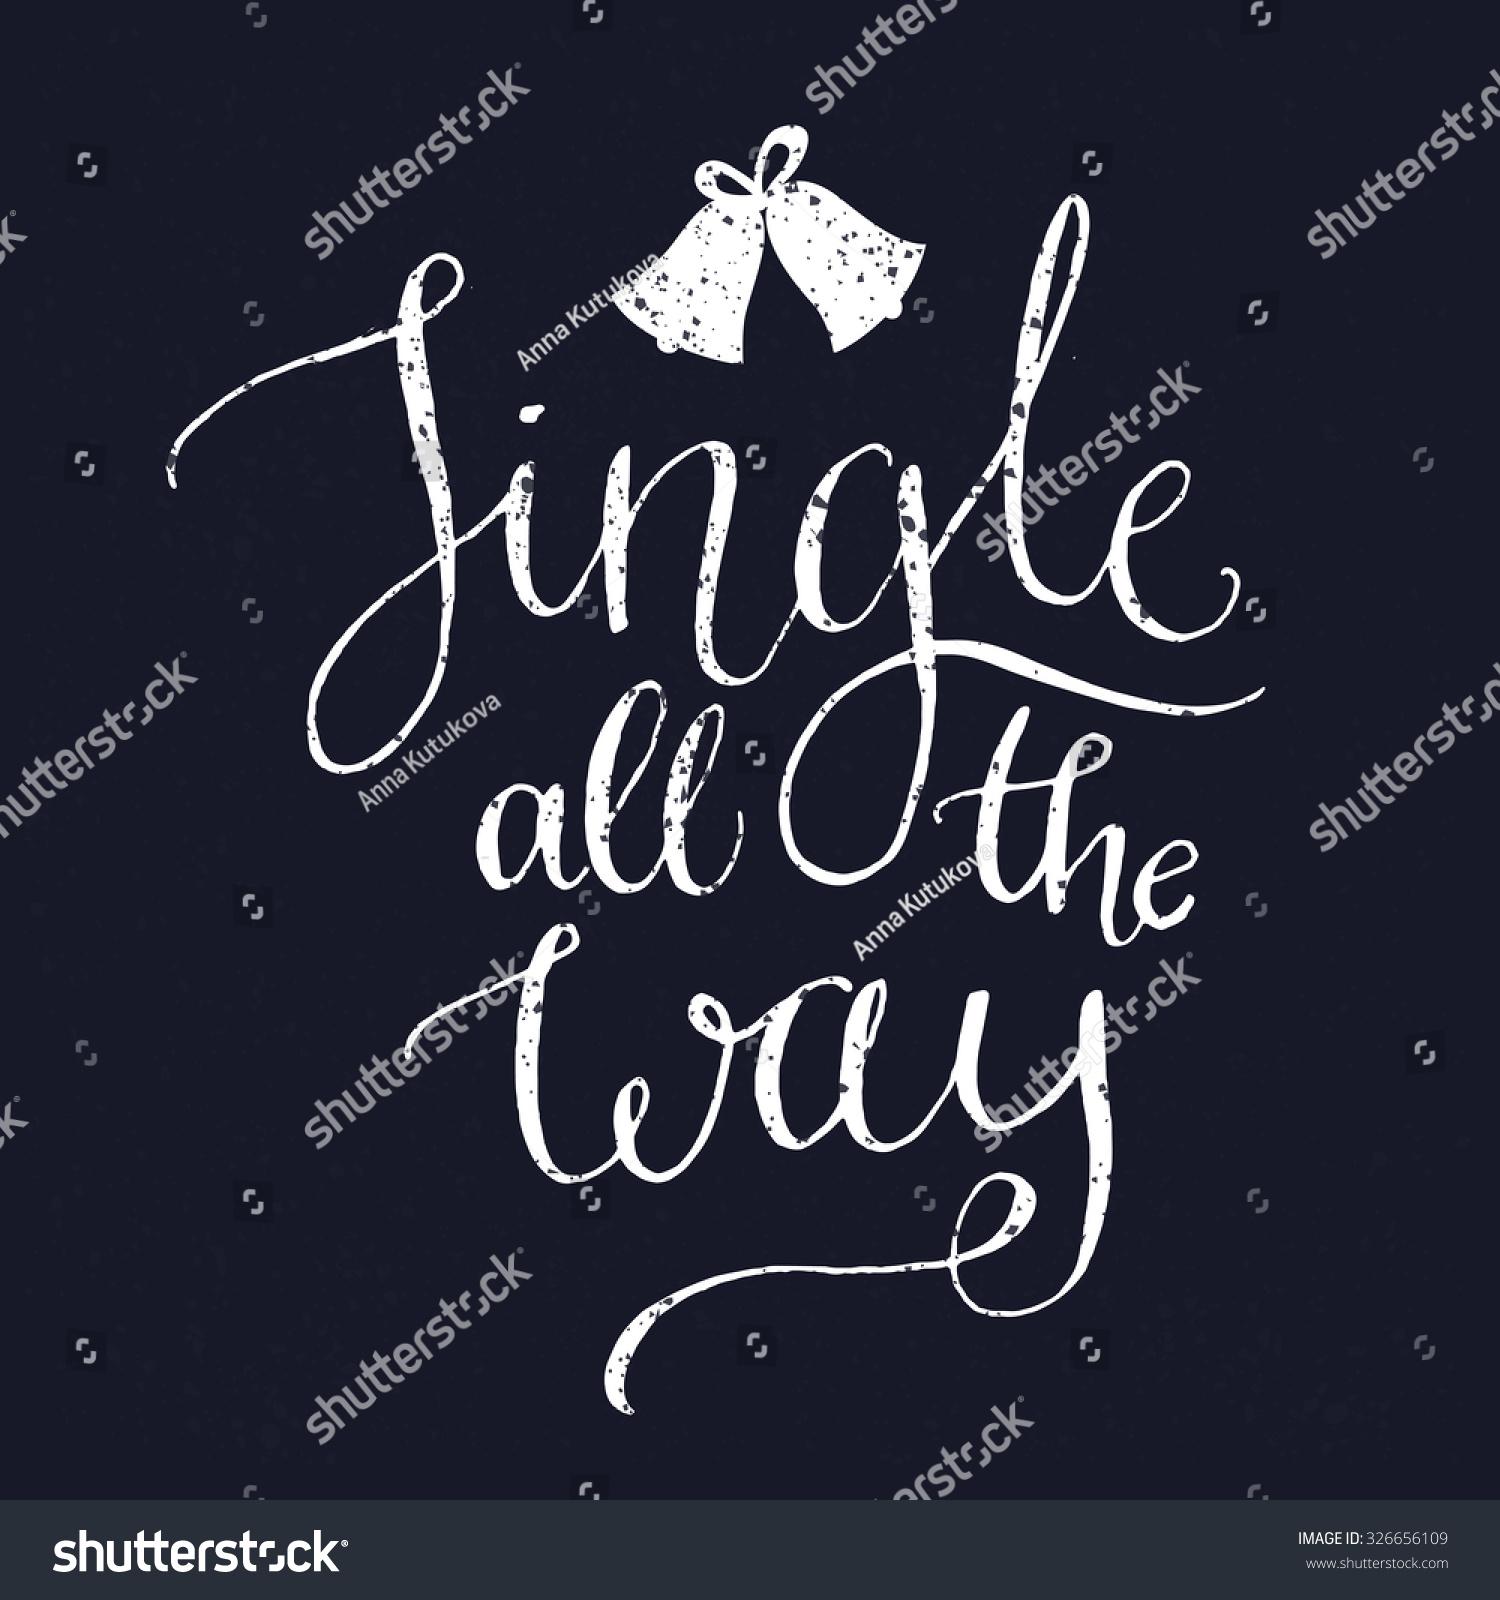 Jingle All Way Christmas Song Inspirational Stock Vector 326656109 - Shutterstock